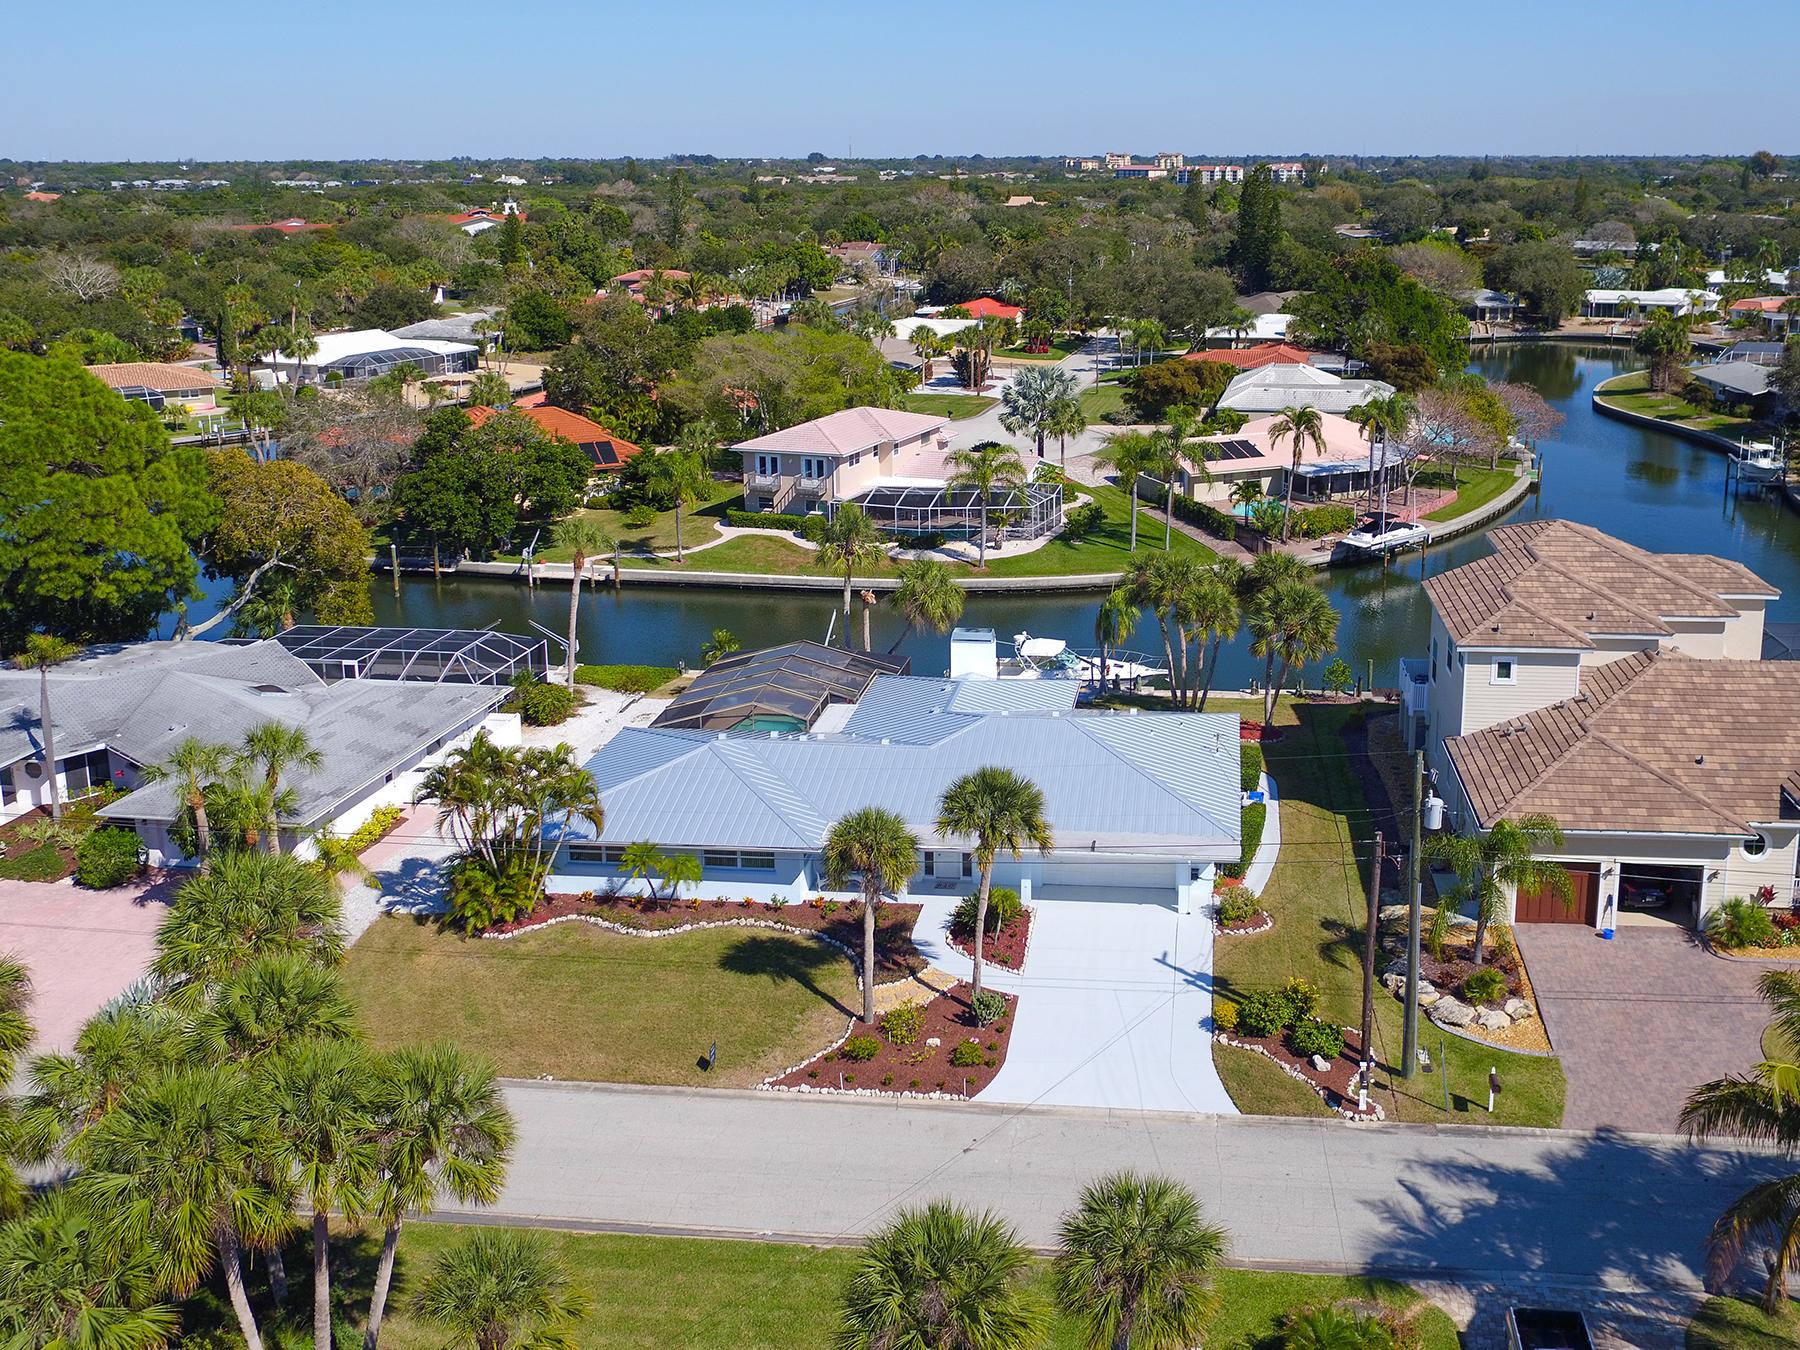 Single Family Home for Sale at SIESTA ISLES 5439 Azure Way Sarasota, Florida, 34242 United States